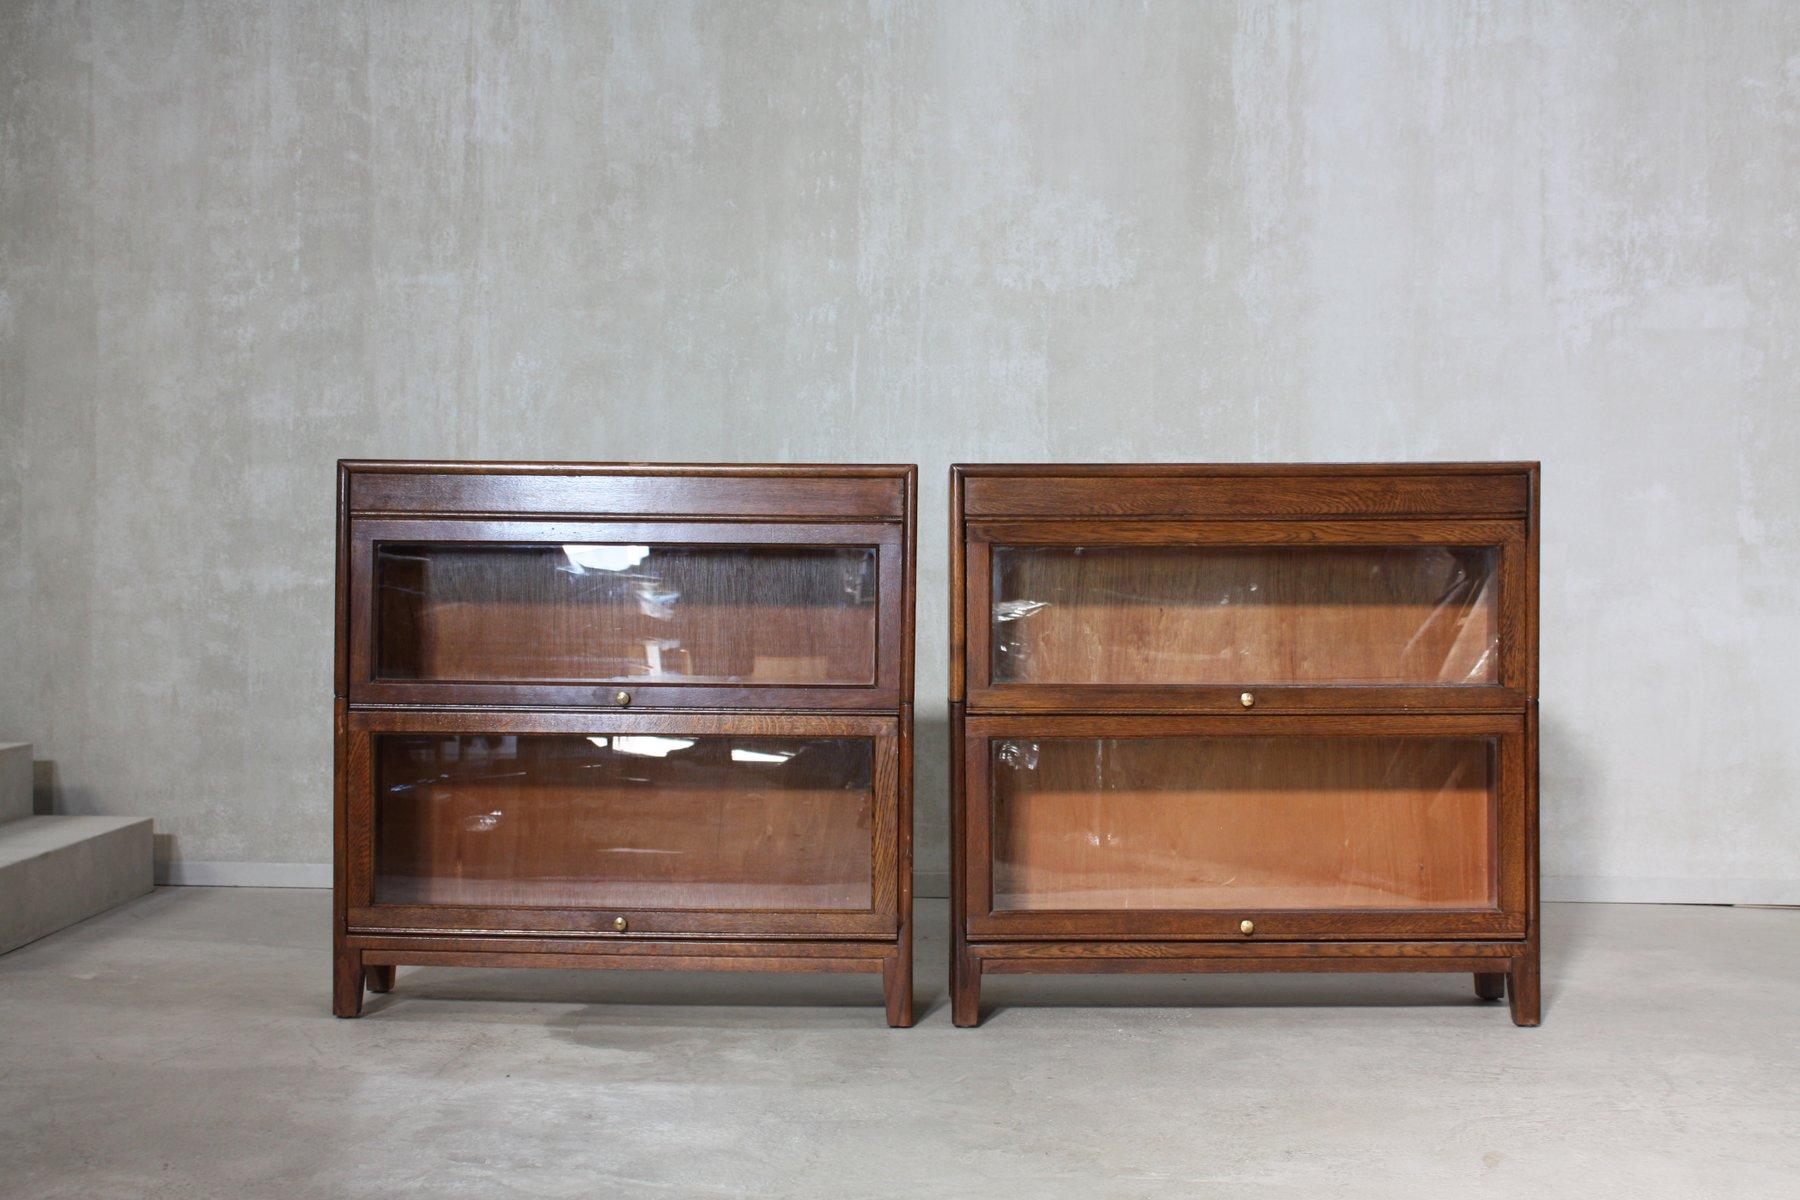 englische vintage b cherregale 1930er 2er set bei pamono kaufen. Black Bedroom Furniture Sets. Home Design Ideas